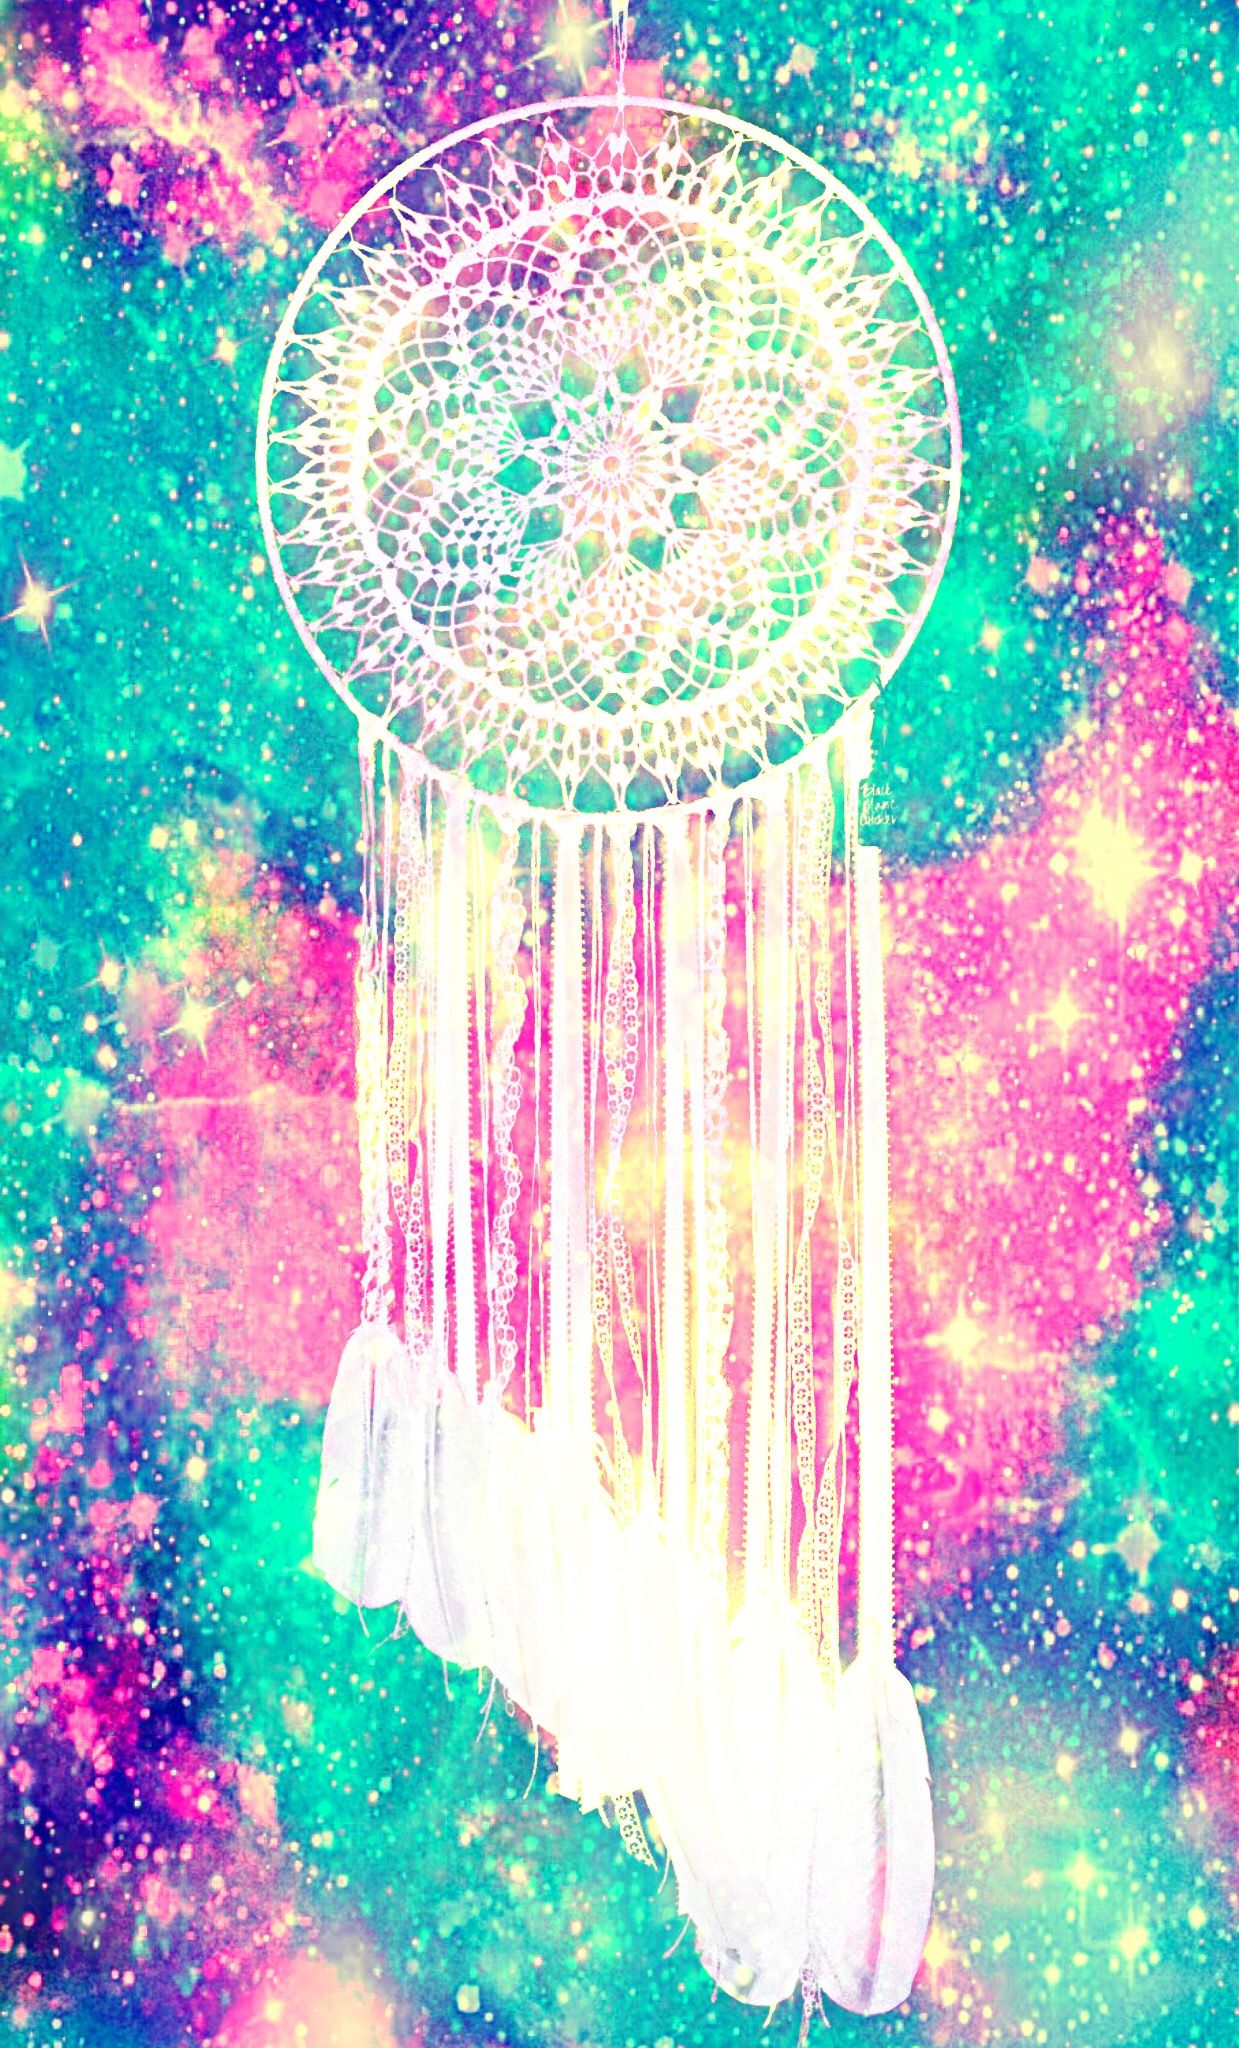 Neon Glow Dreamcatcher Galaxy Wallpaper